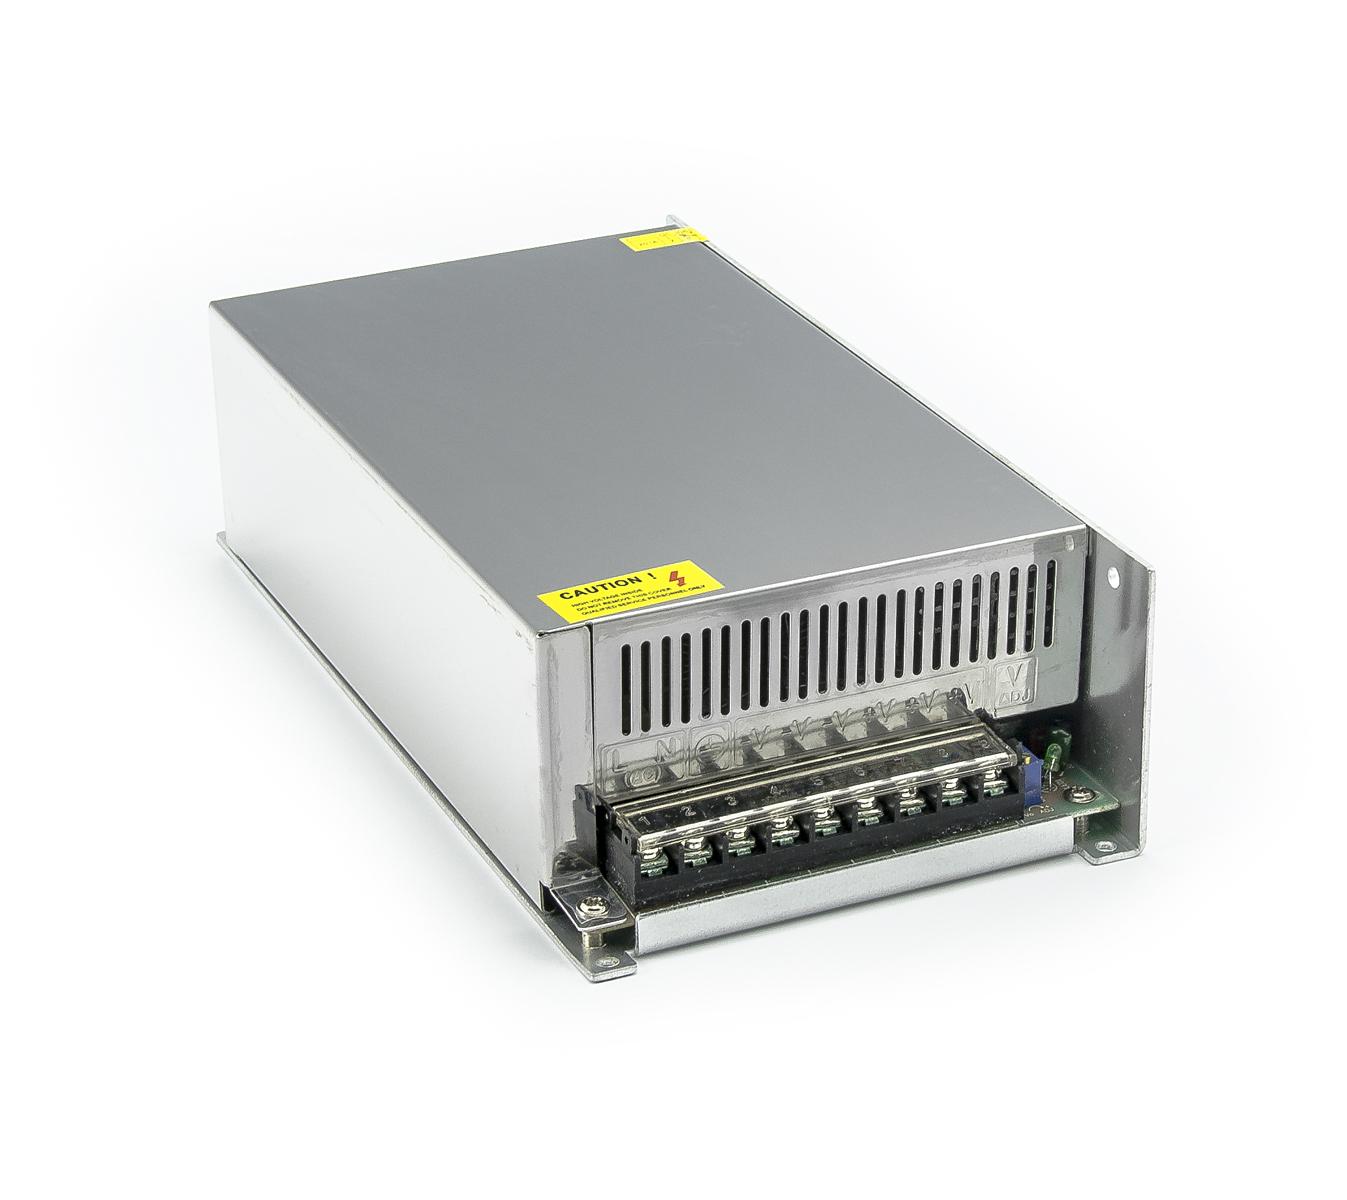 Průmyslový zdroj WXD-720W 24V 30A 720W